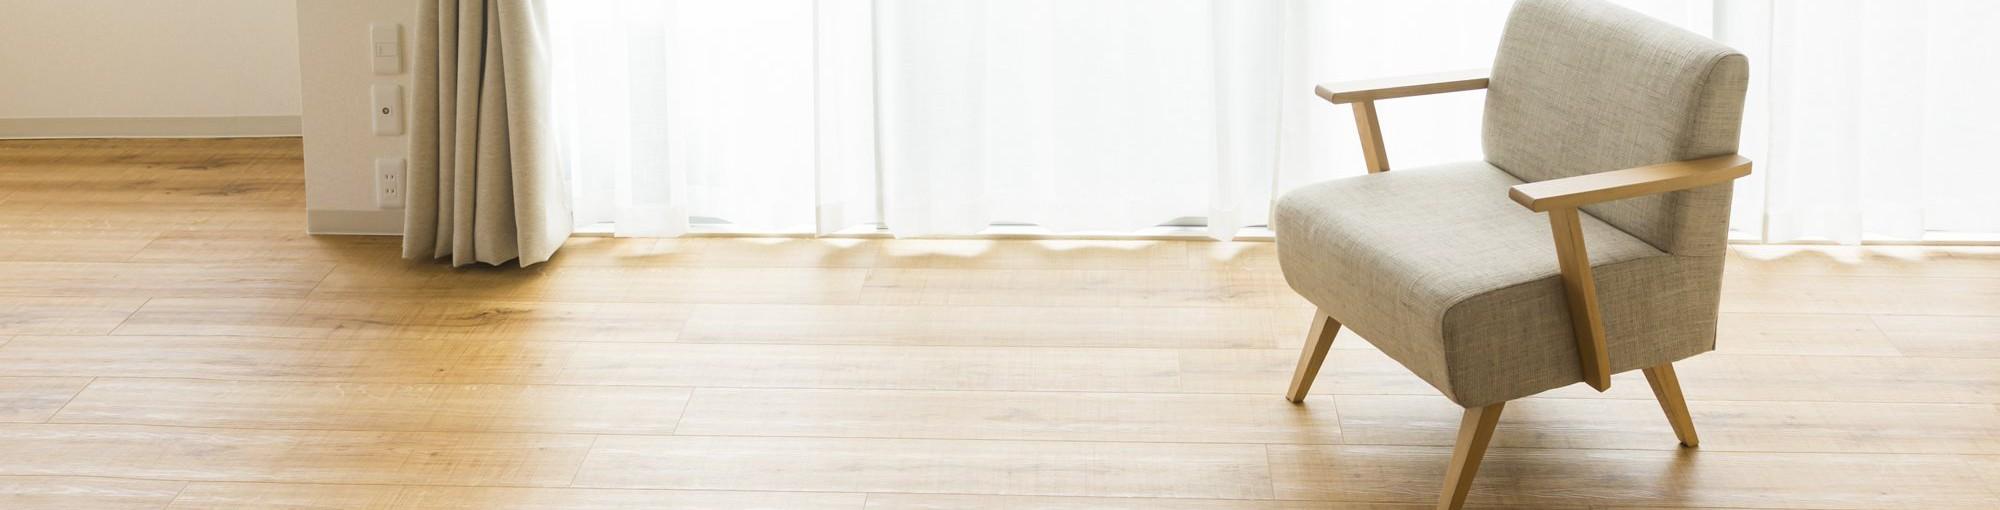 bodenverlegung raumausstatter lindorfer. Black Bedroom Furniture Sets. Home Design Ideas